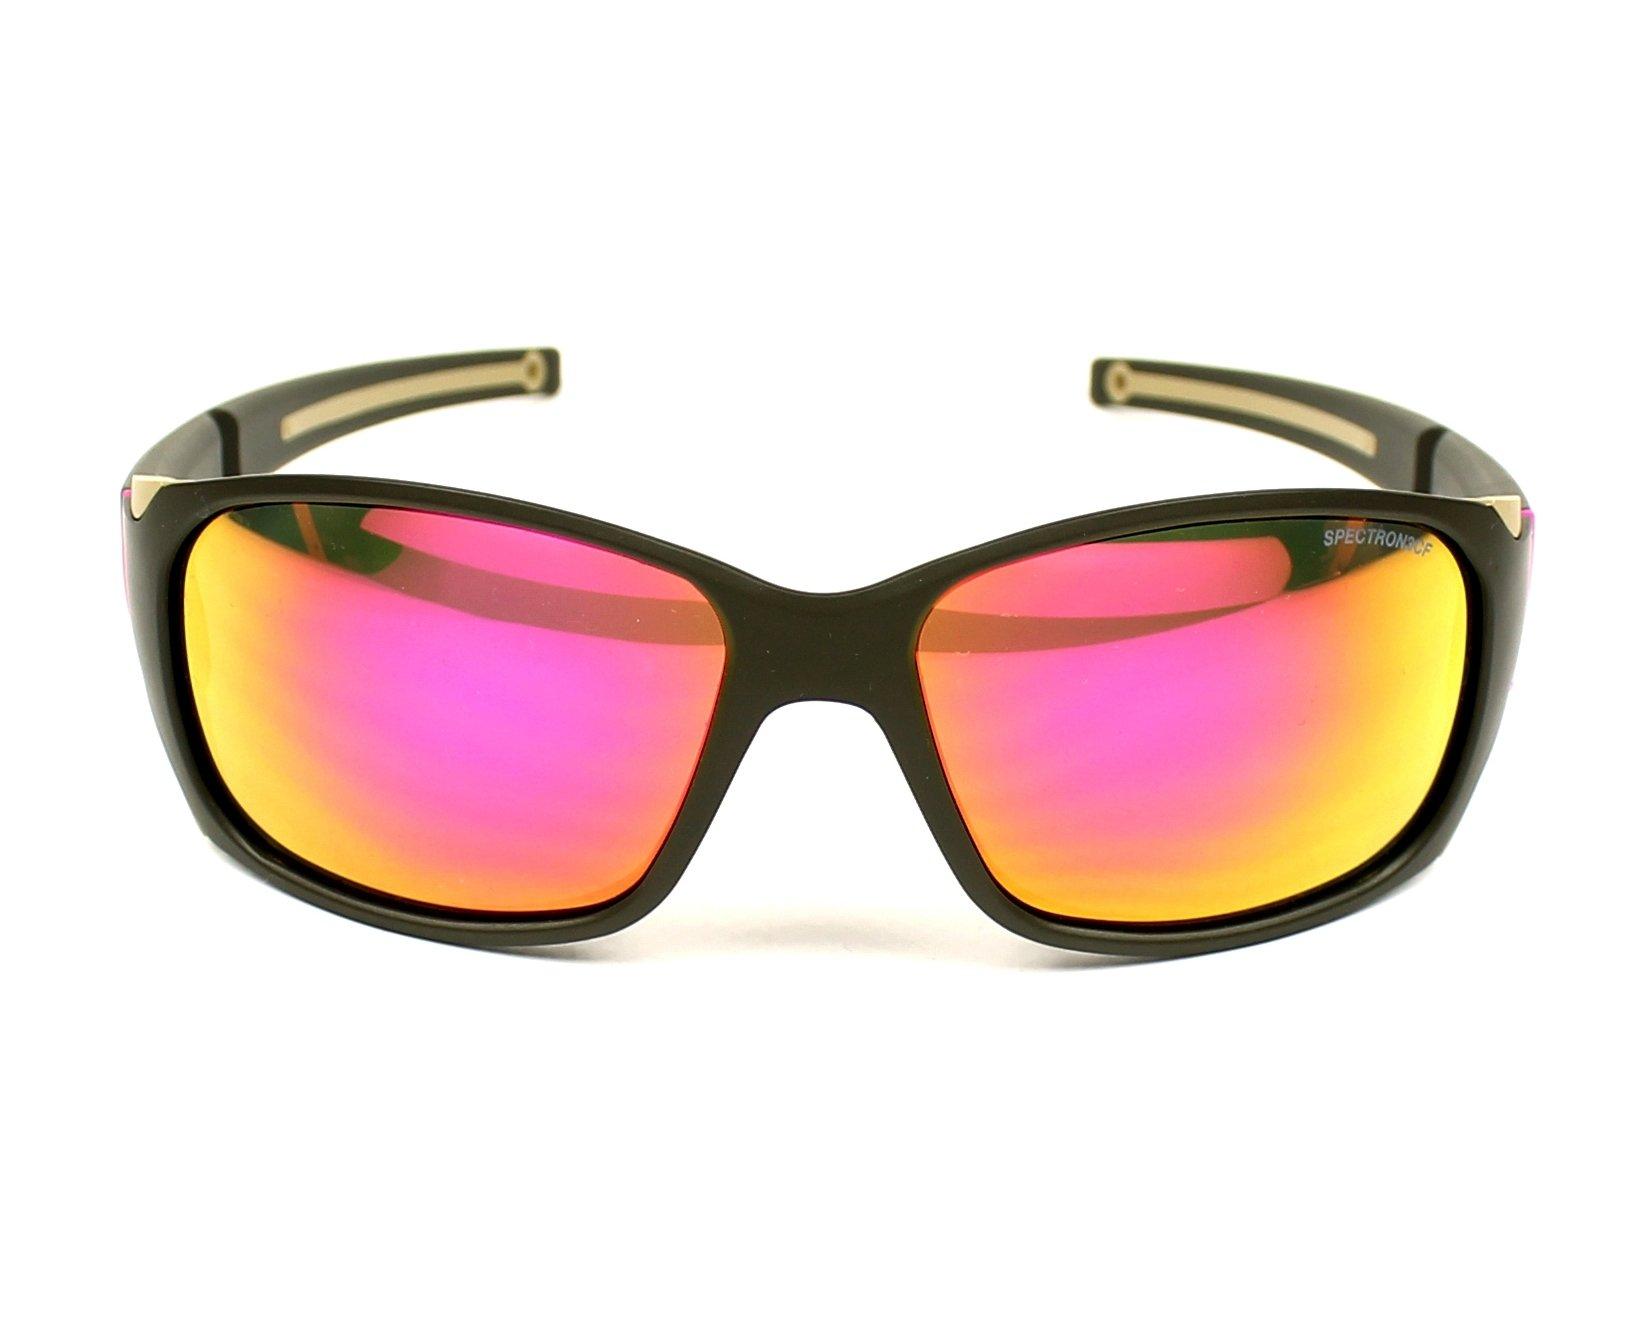 1c47e451b5 Sunglasses Julbo J401 1154 58-15 Grey Pink front view